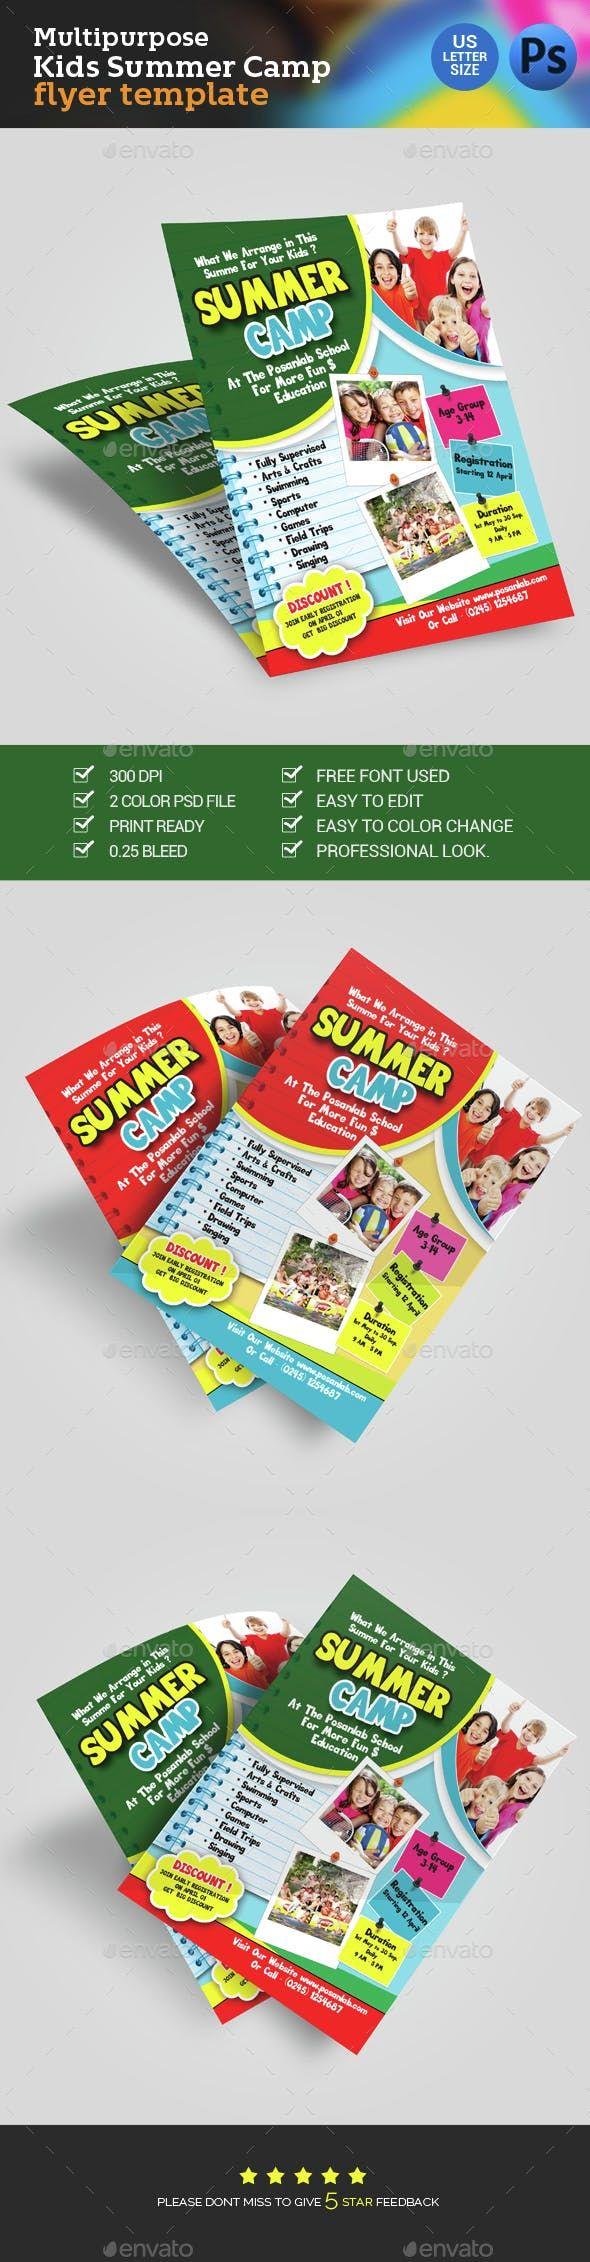 Kids Summer Camp Flyer — Photoshop PSD #marketing #summer ...